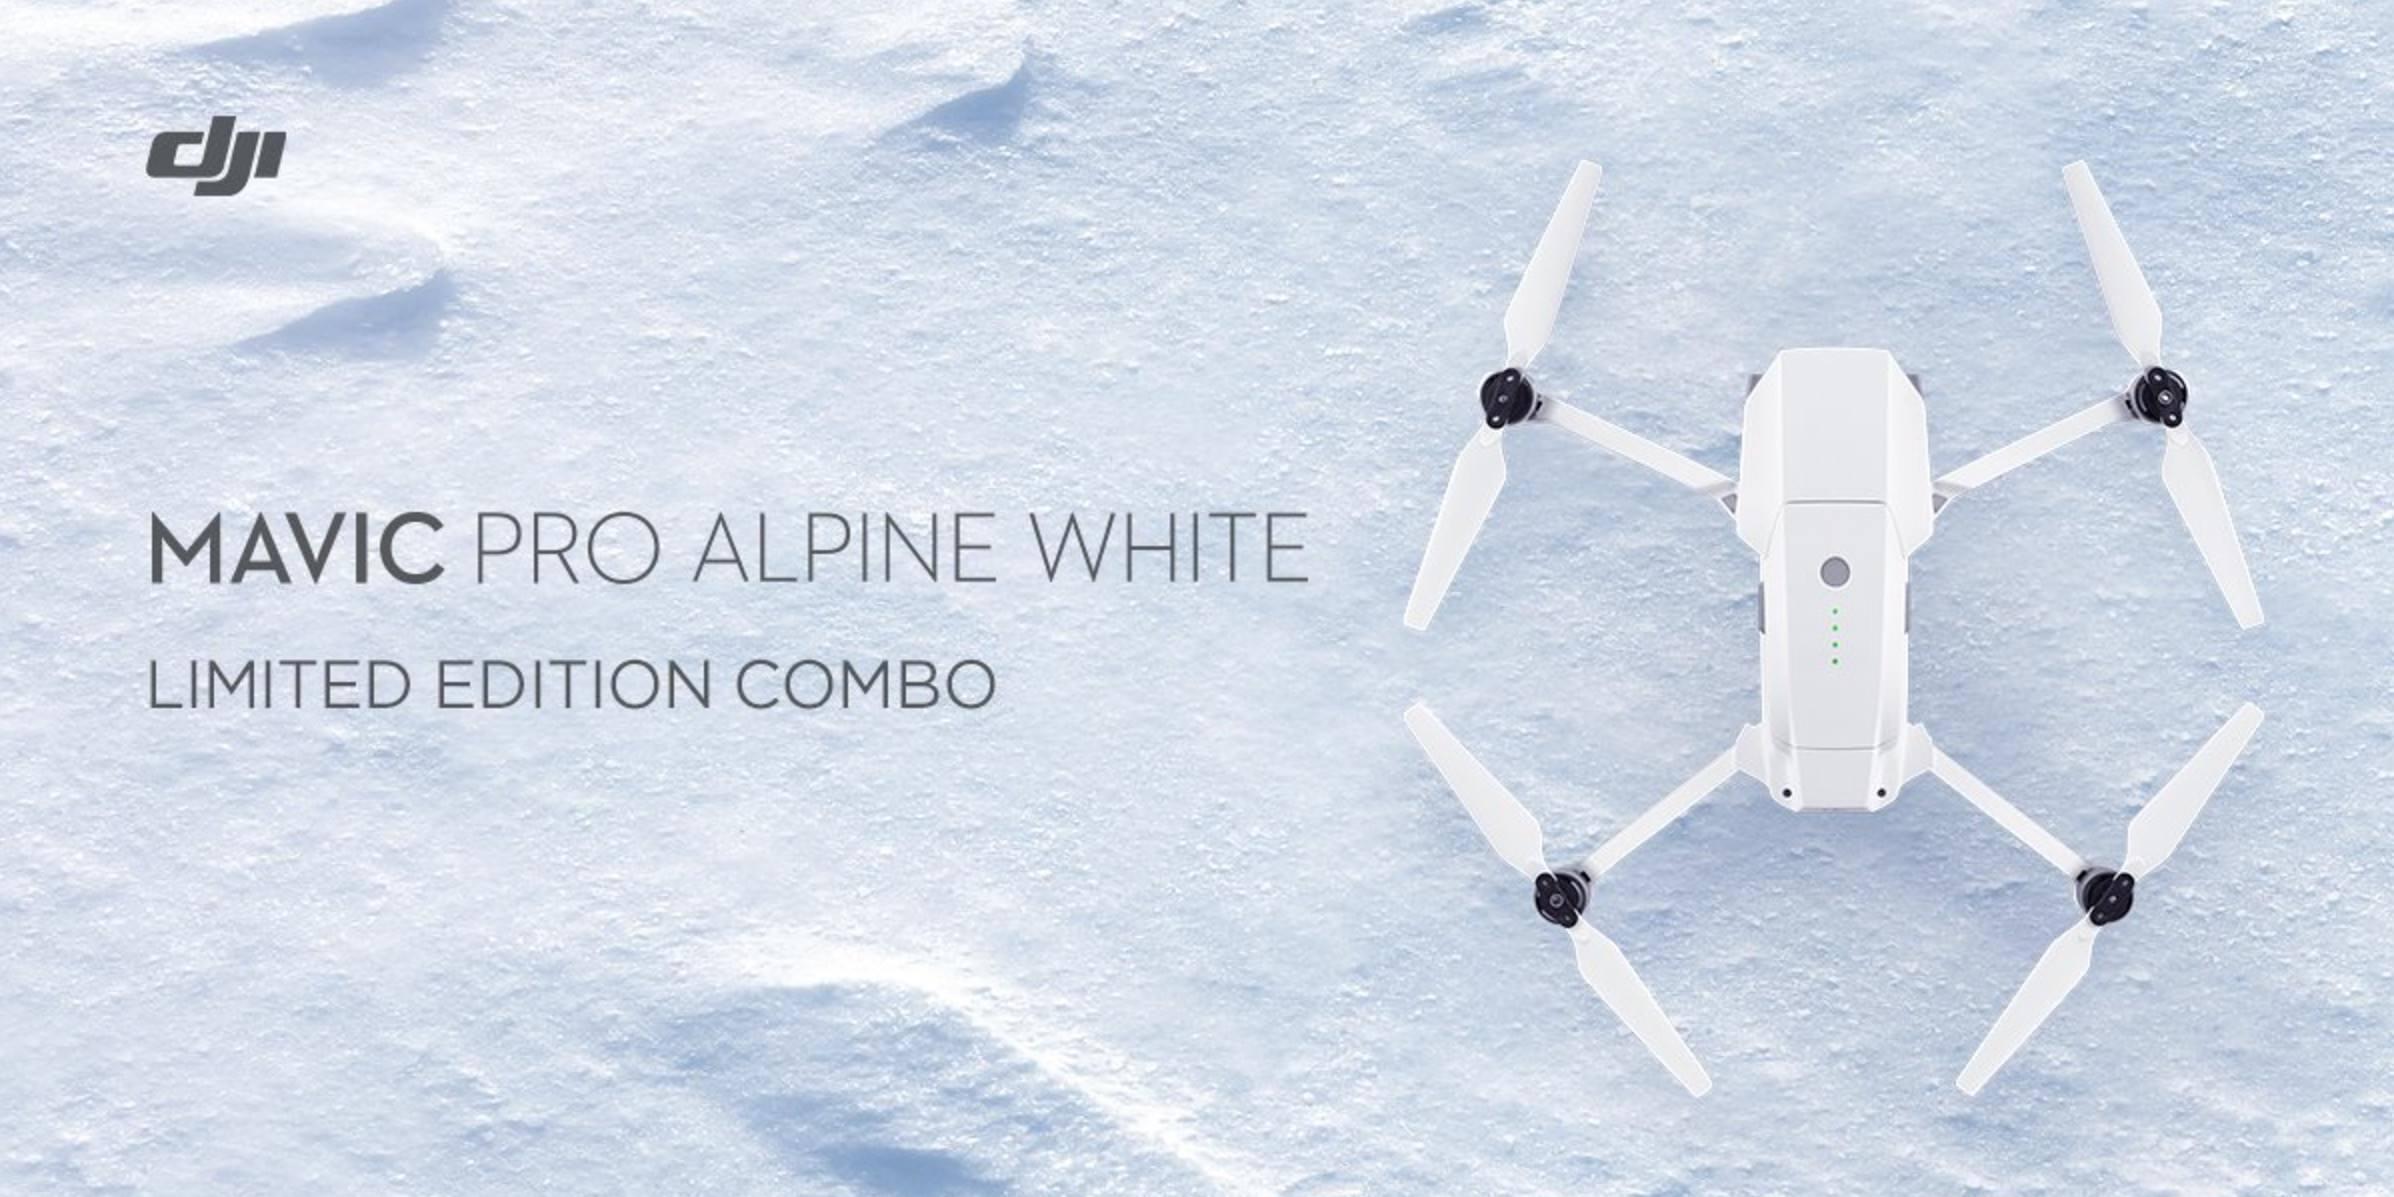 DJI Mavic Pro Alpine Edition includes $200 worth of accessories for $779 (Reg. $1,000)